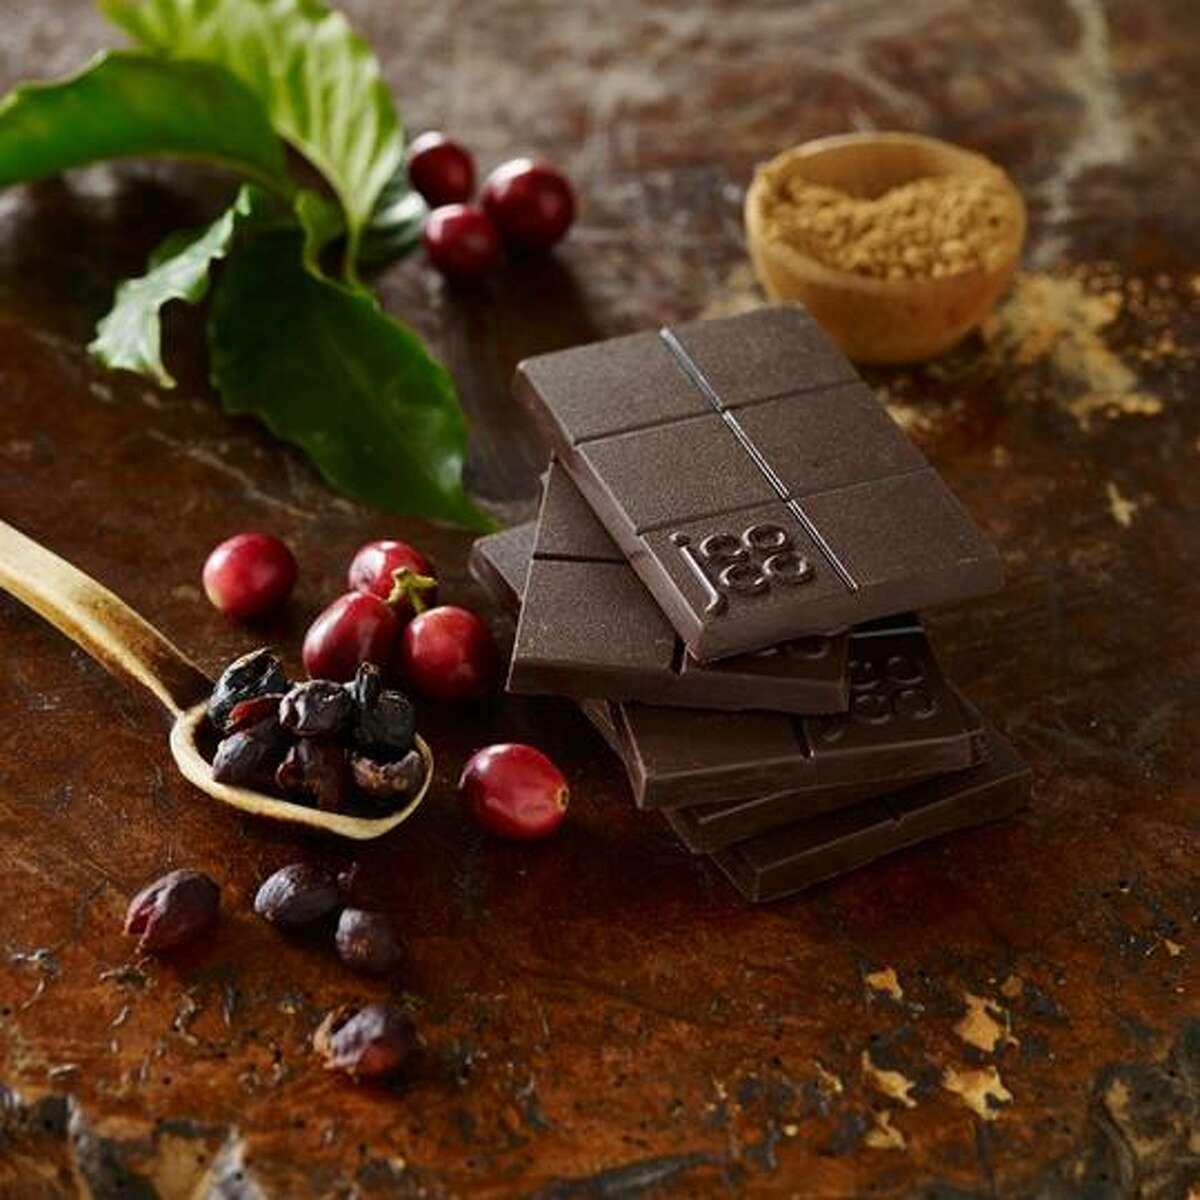 jcoco chocolate